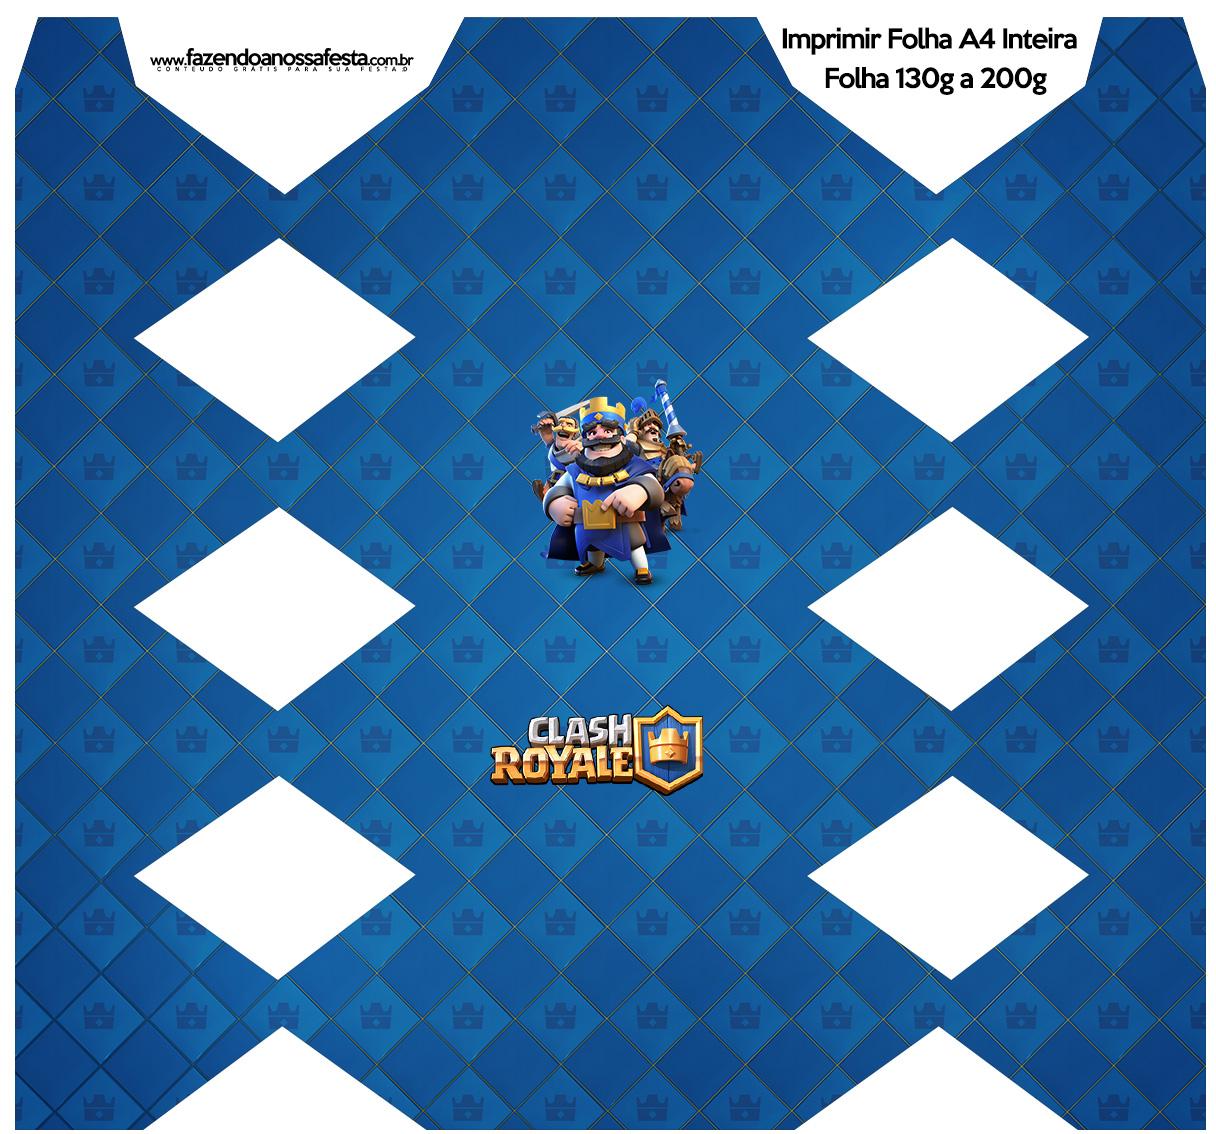 Caixa Bala Clash Royale